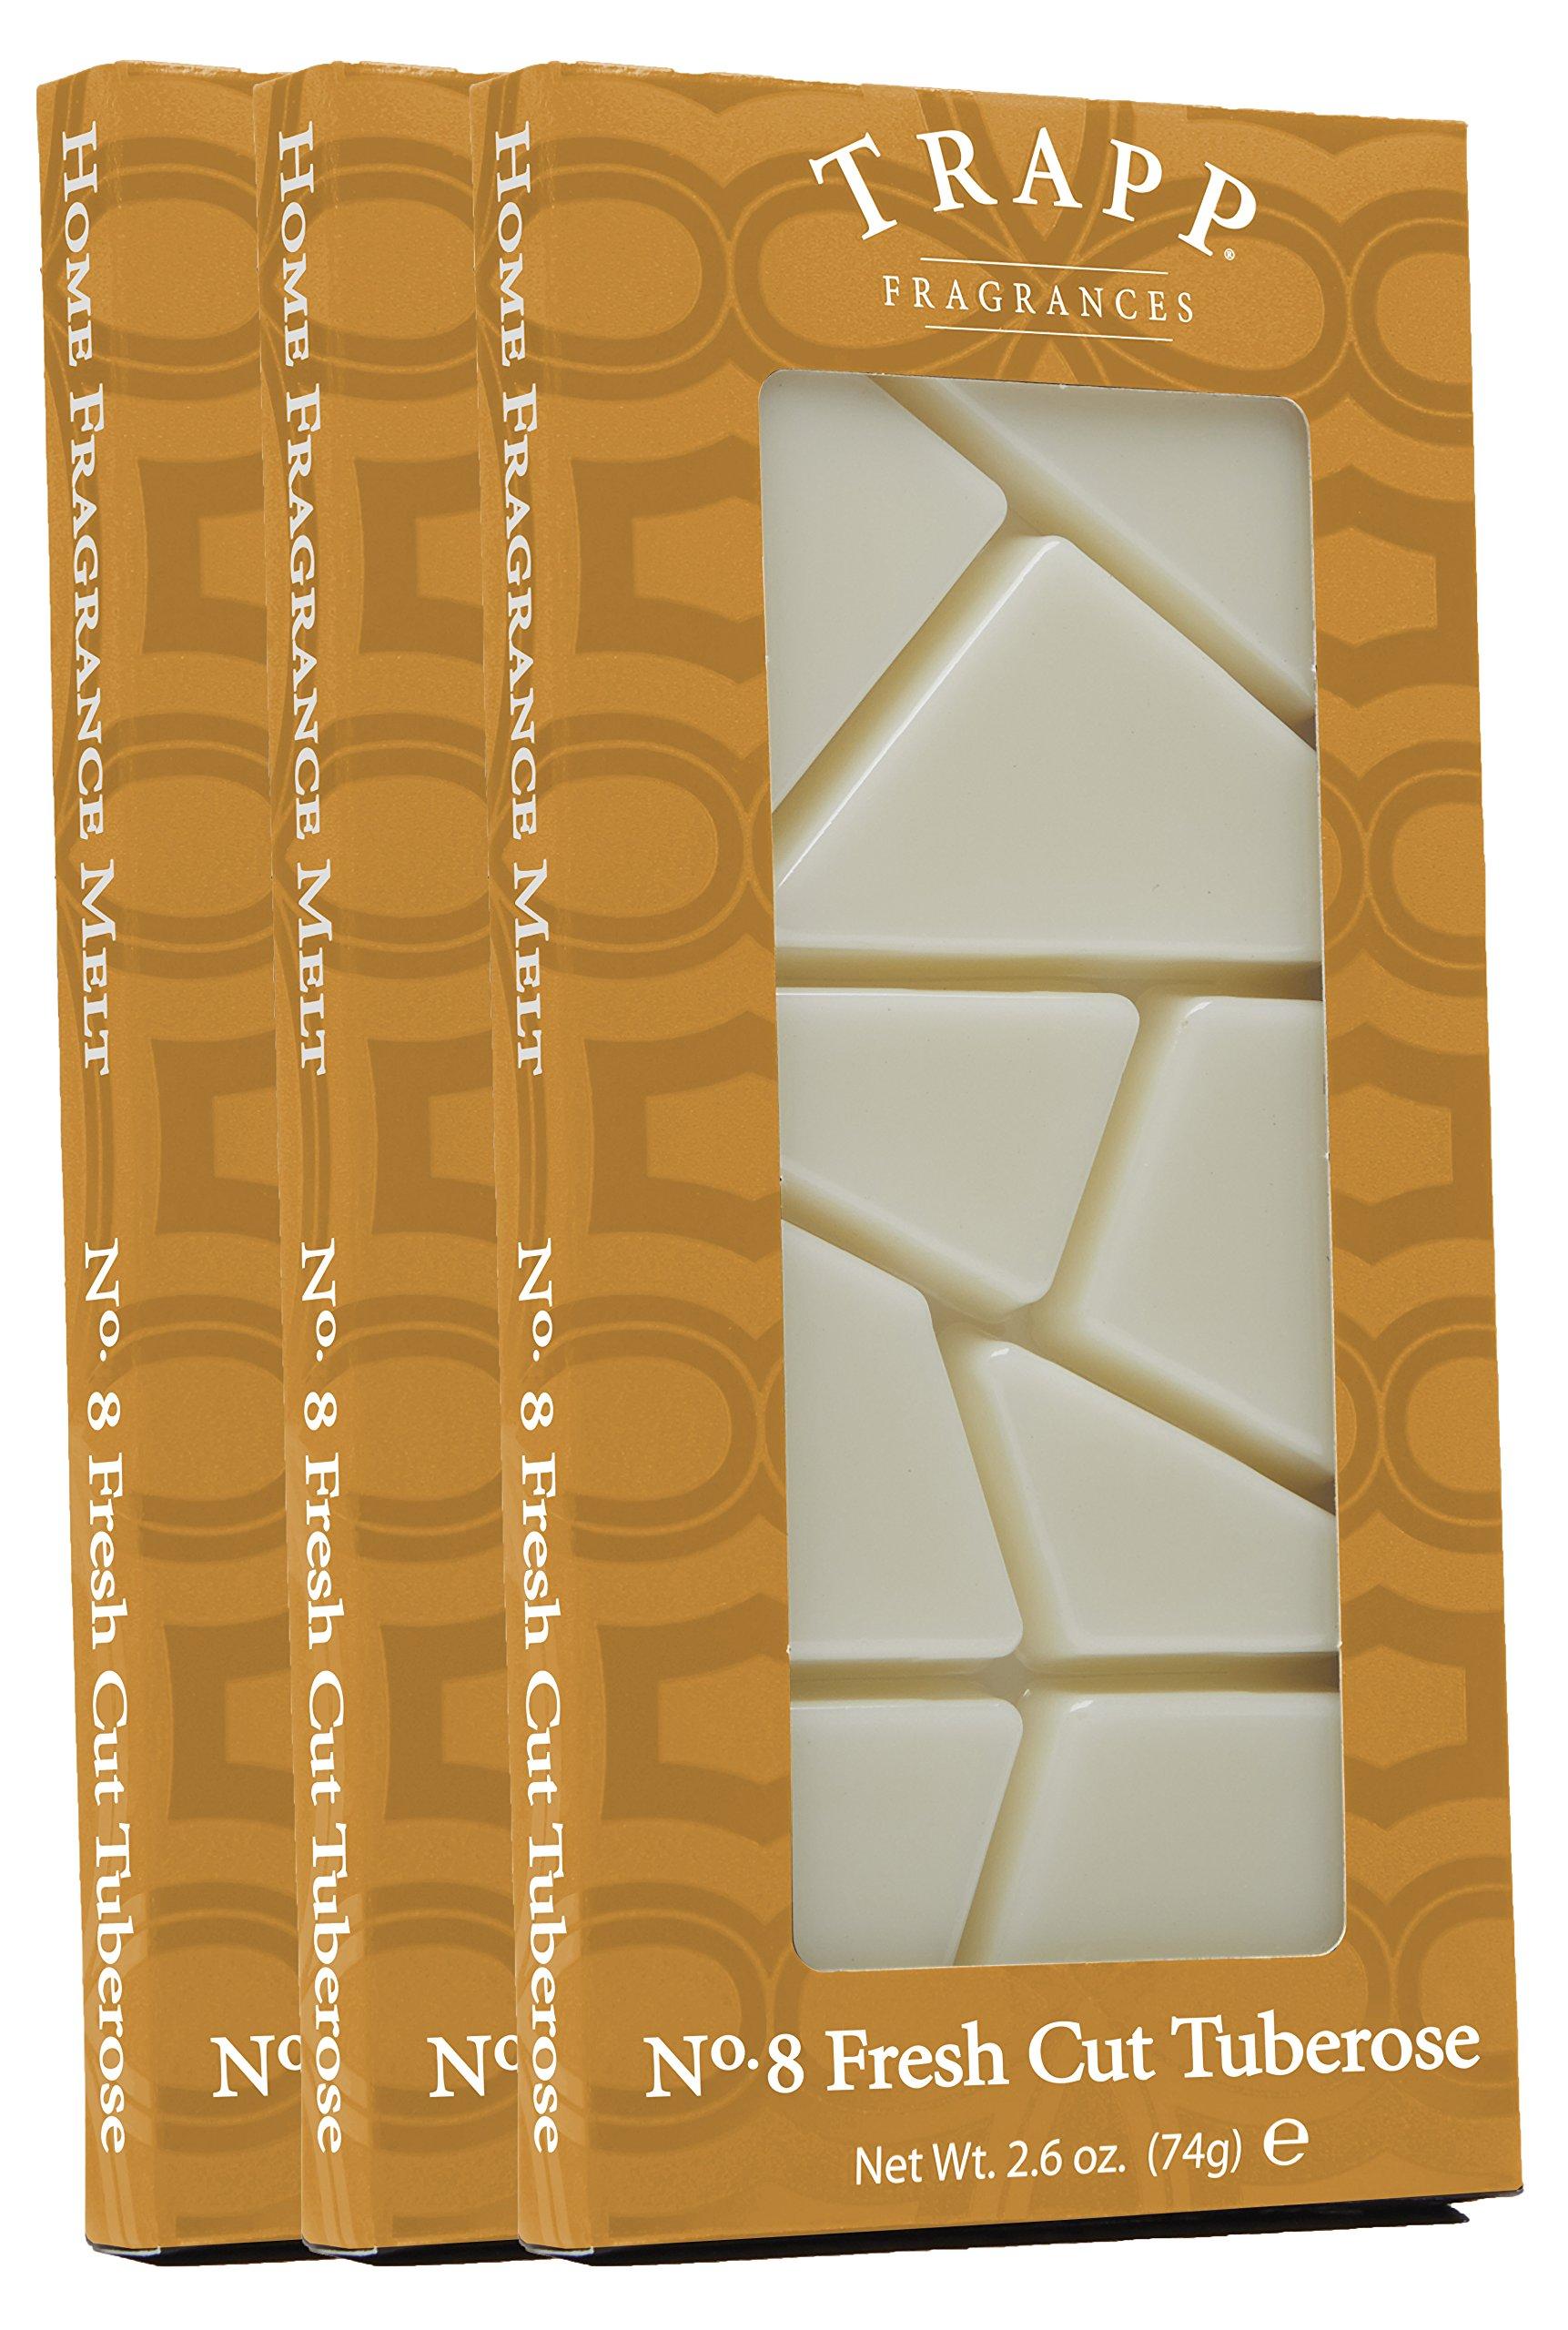 Trapp Home Fragrance Melt, No. 8 Fresh Cut Tuberose, 2.6-Ounce, 3-Pack